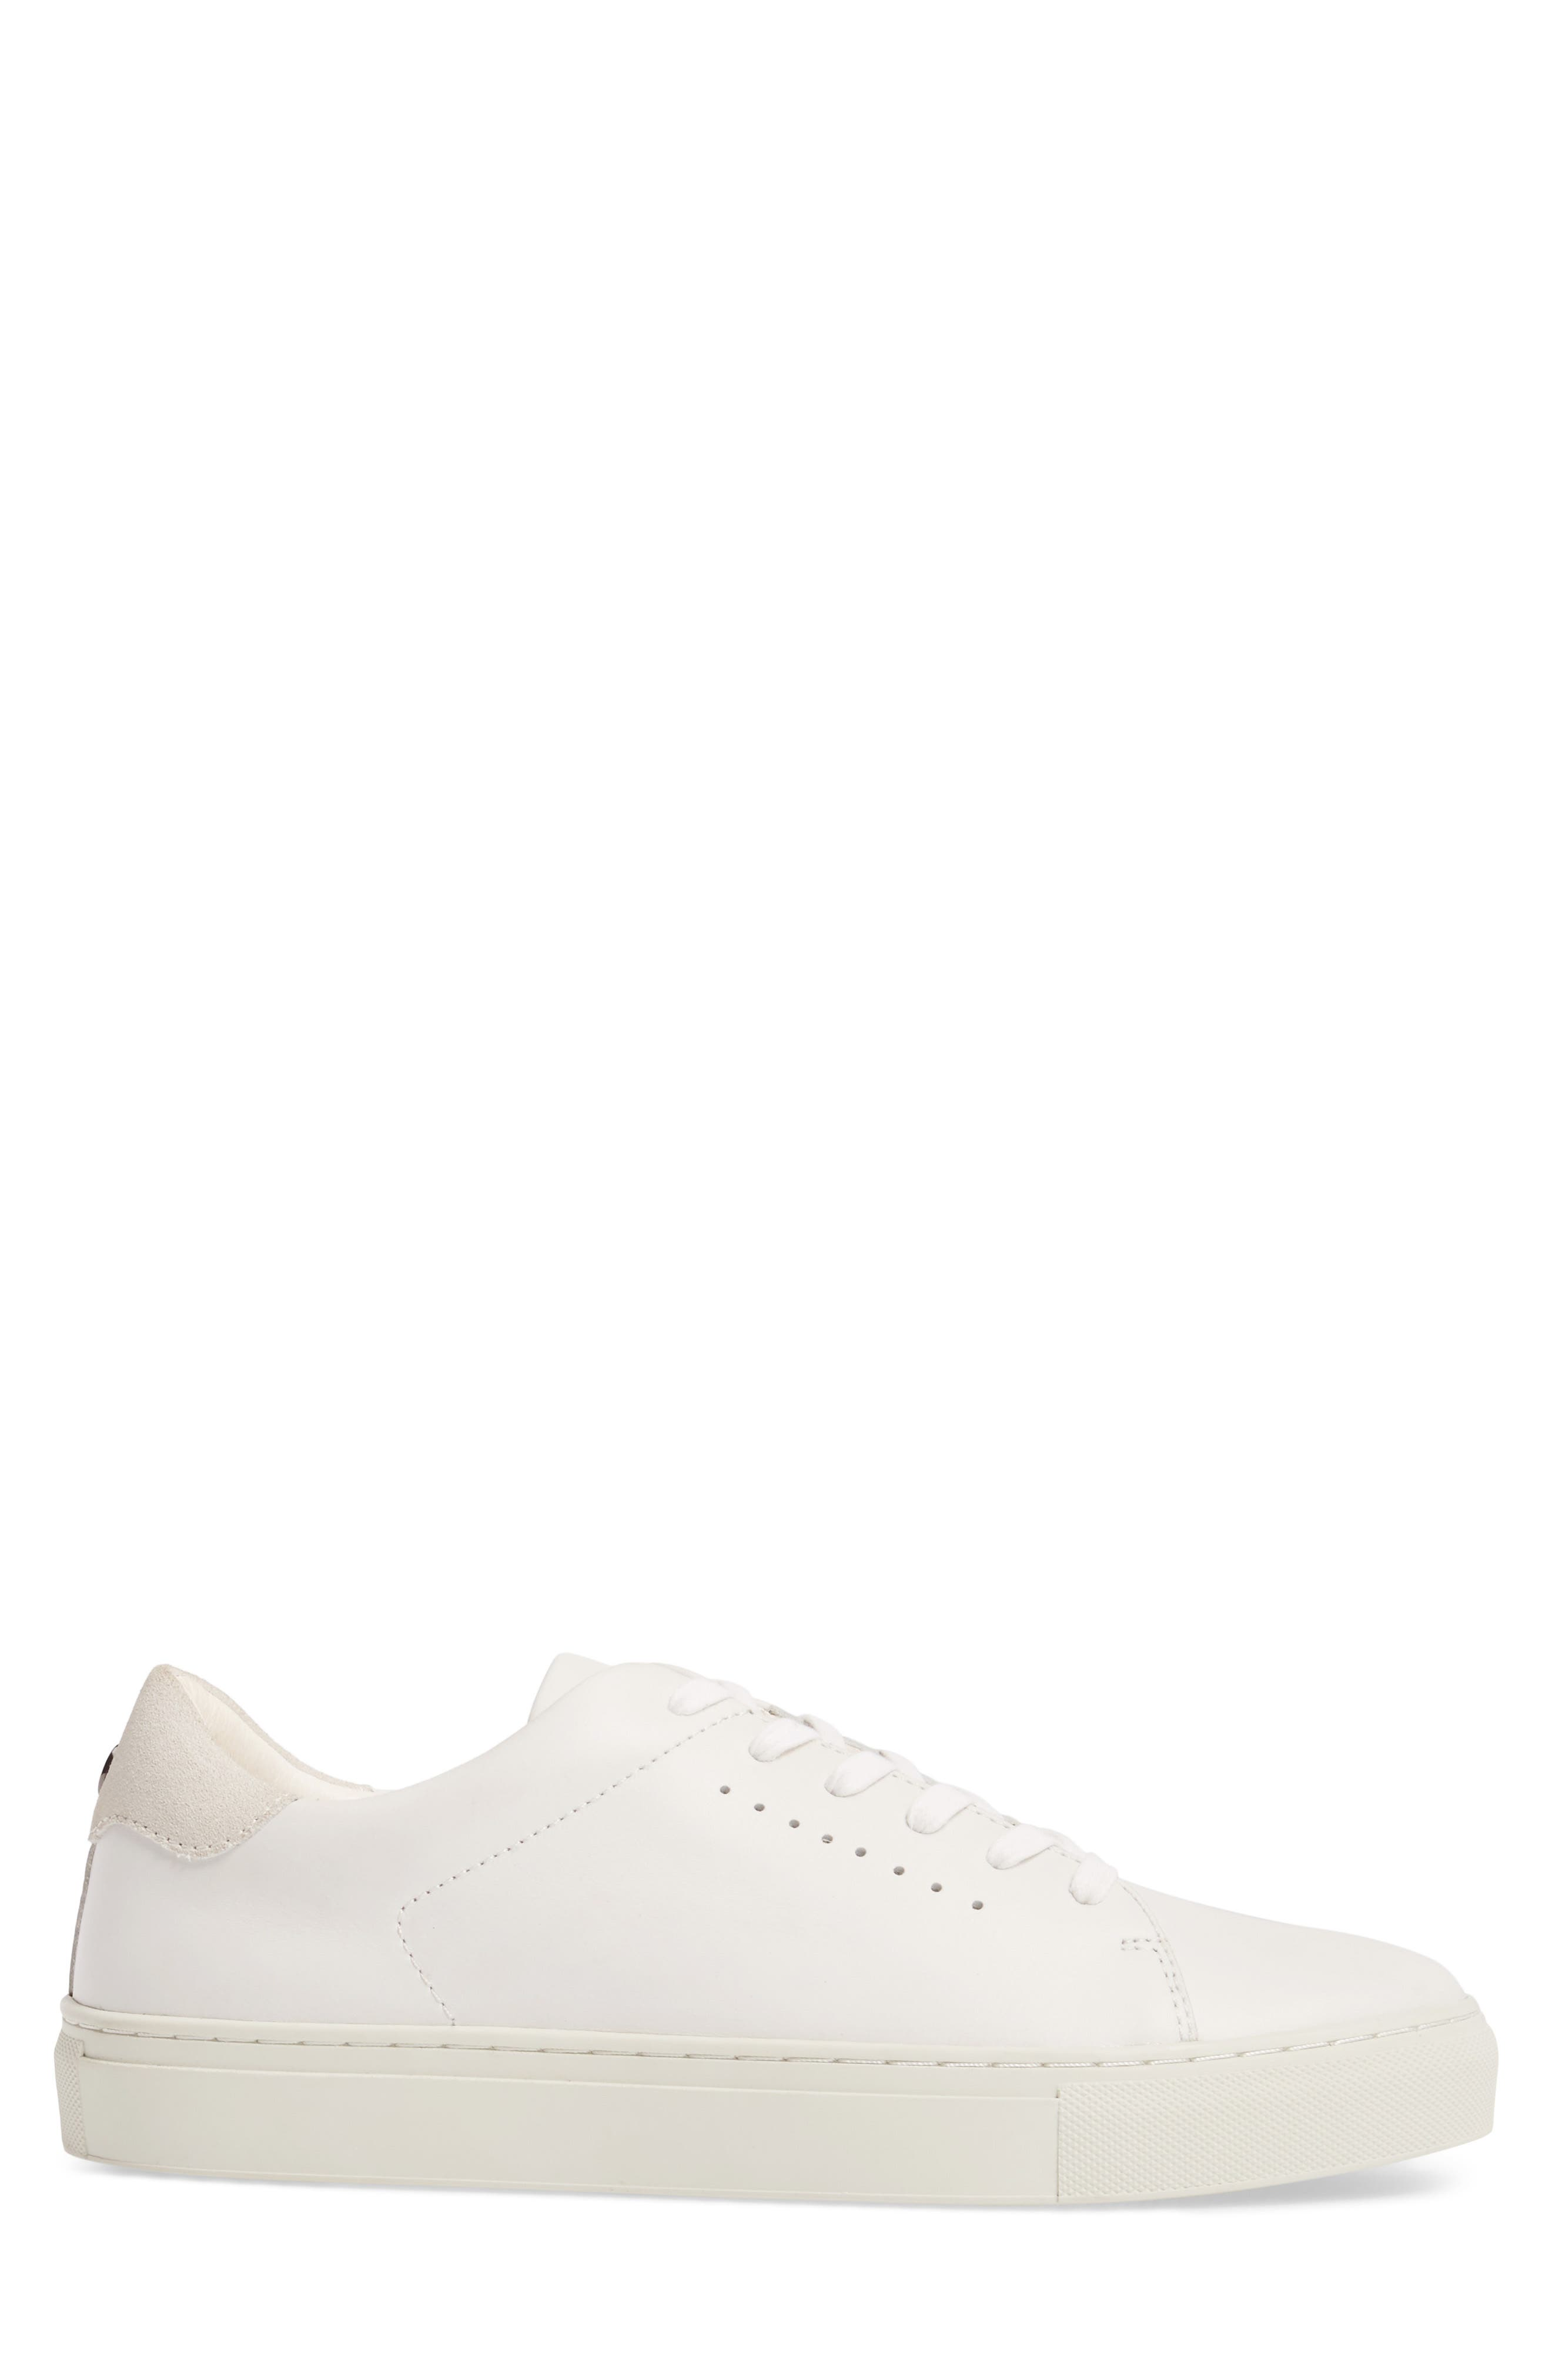 Desmond Sneaker,                             Alternate thumbnail 3, color,                             WHITE LEATHER